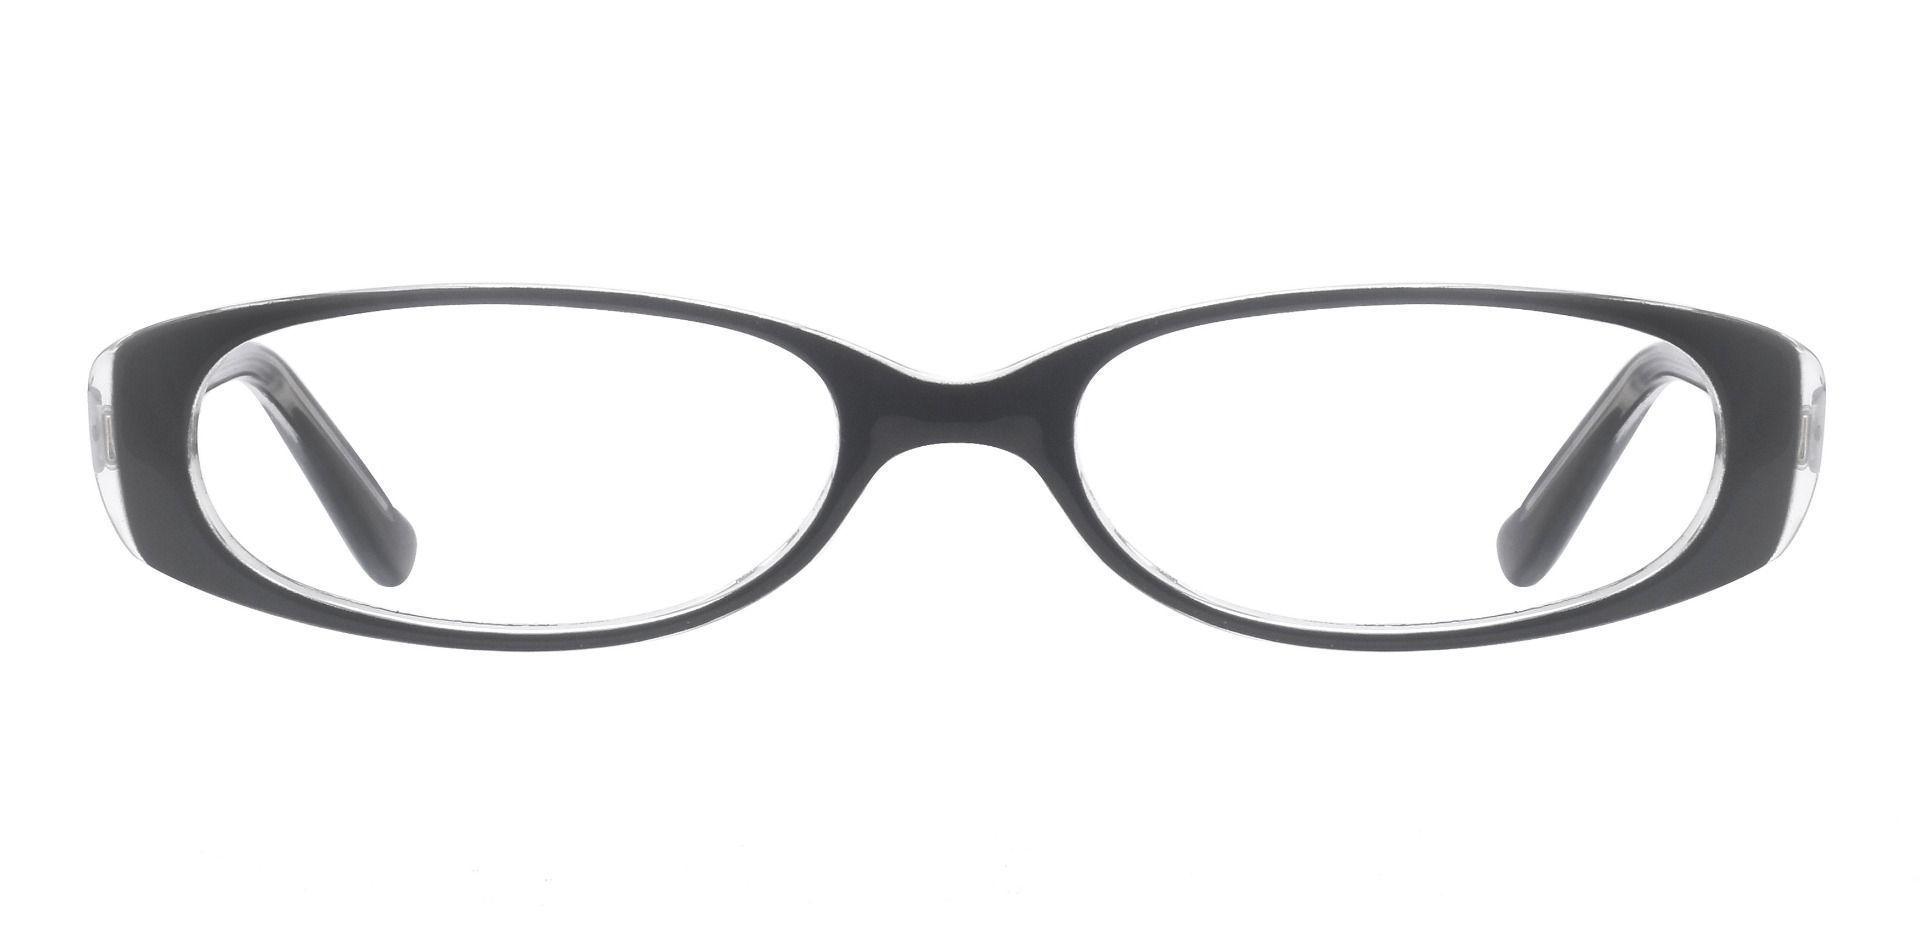 Venetia Oval Blue Light Blocking Glasses - Black Crystal